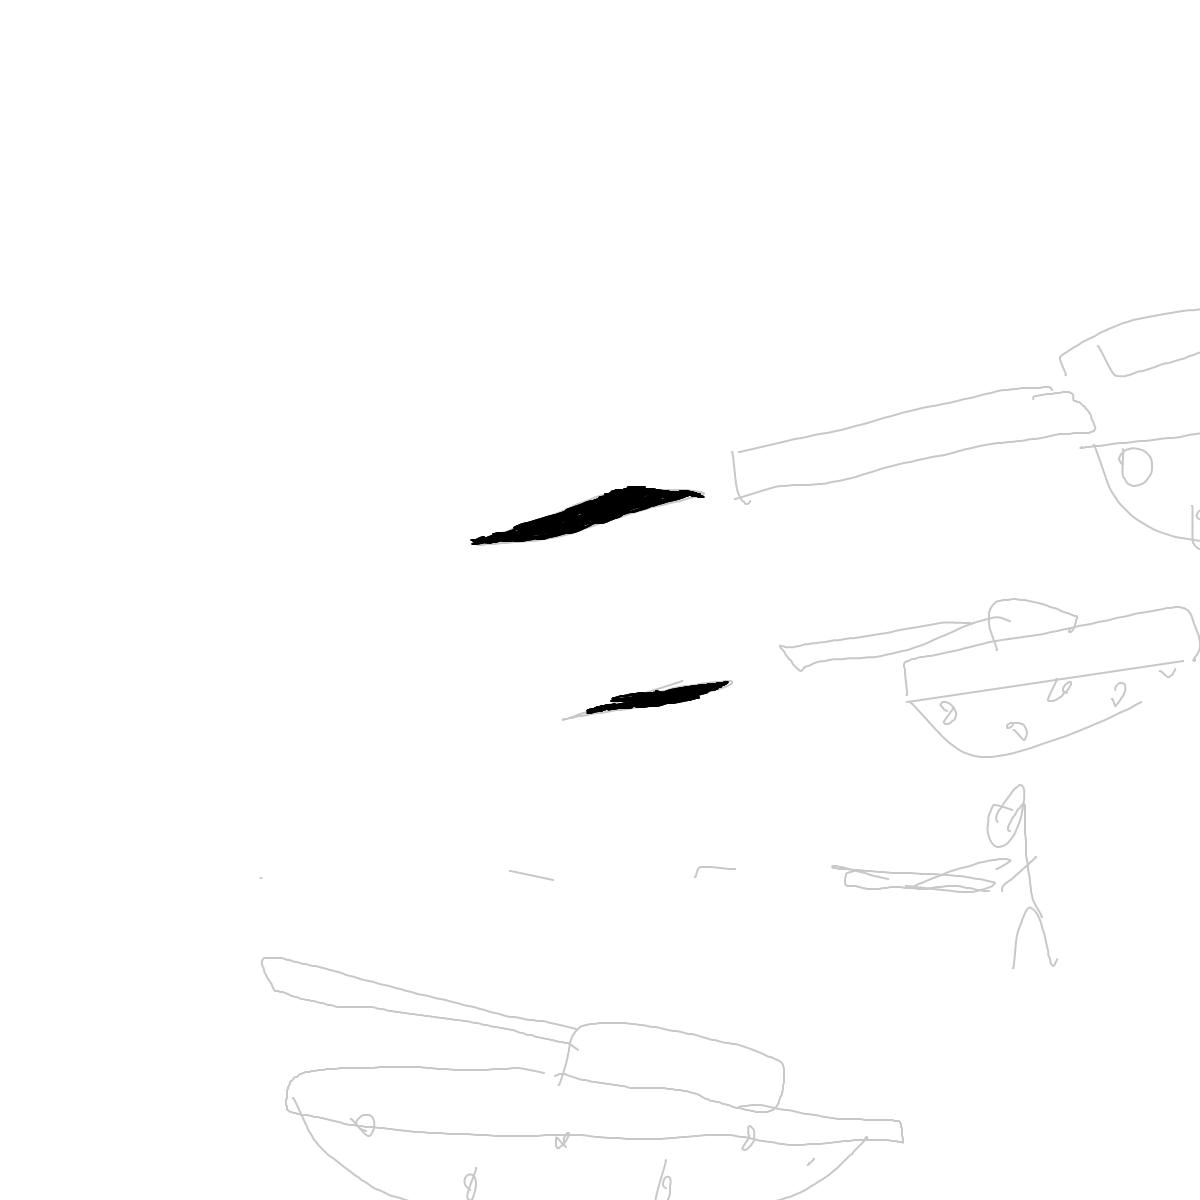 BAAAM drawing#4161 lat:55.6677818298339840lng: 12.5703678131103520